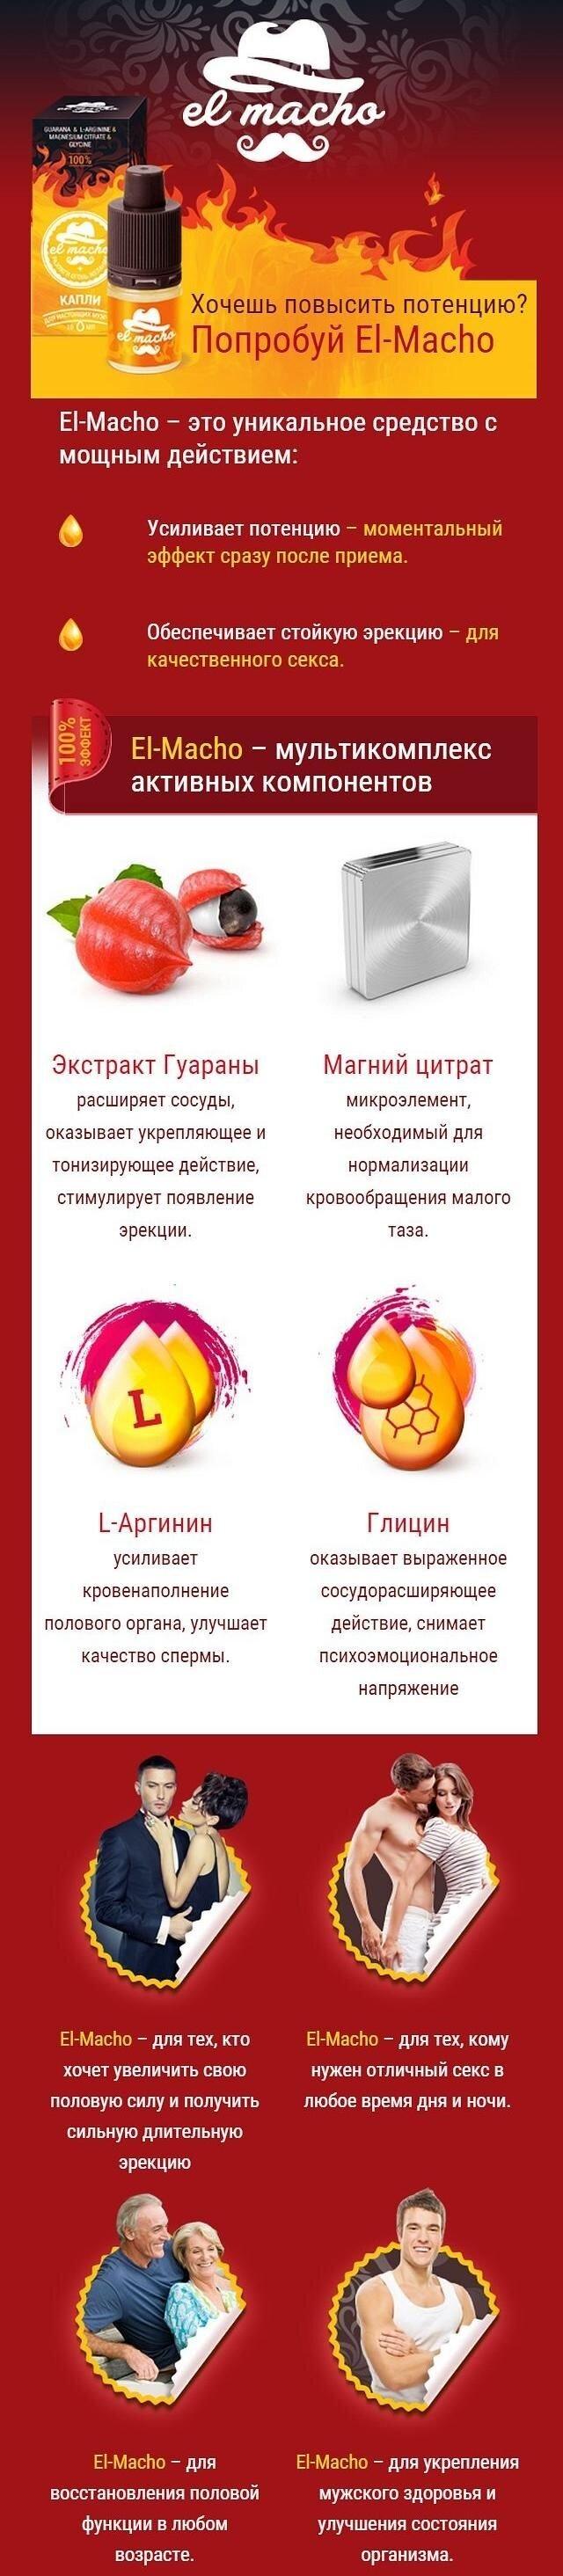 znakomstva-s-seksualnimi-devushkami-v-ukraine